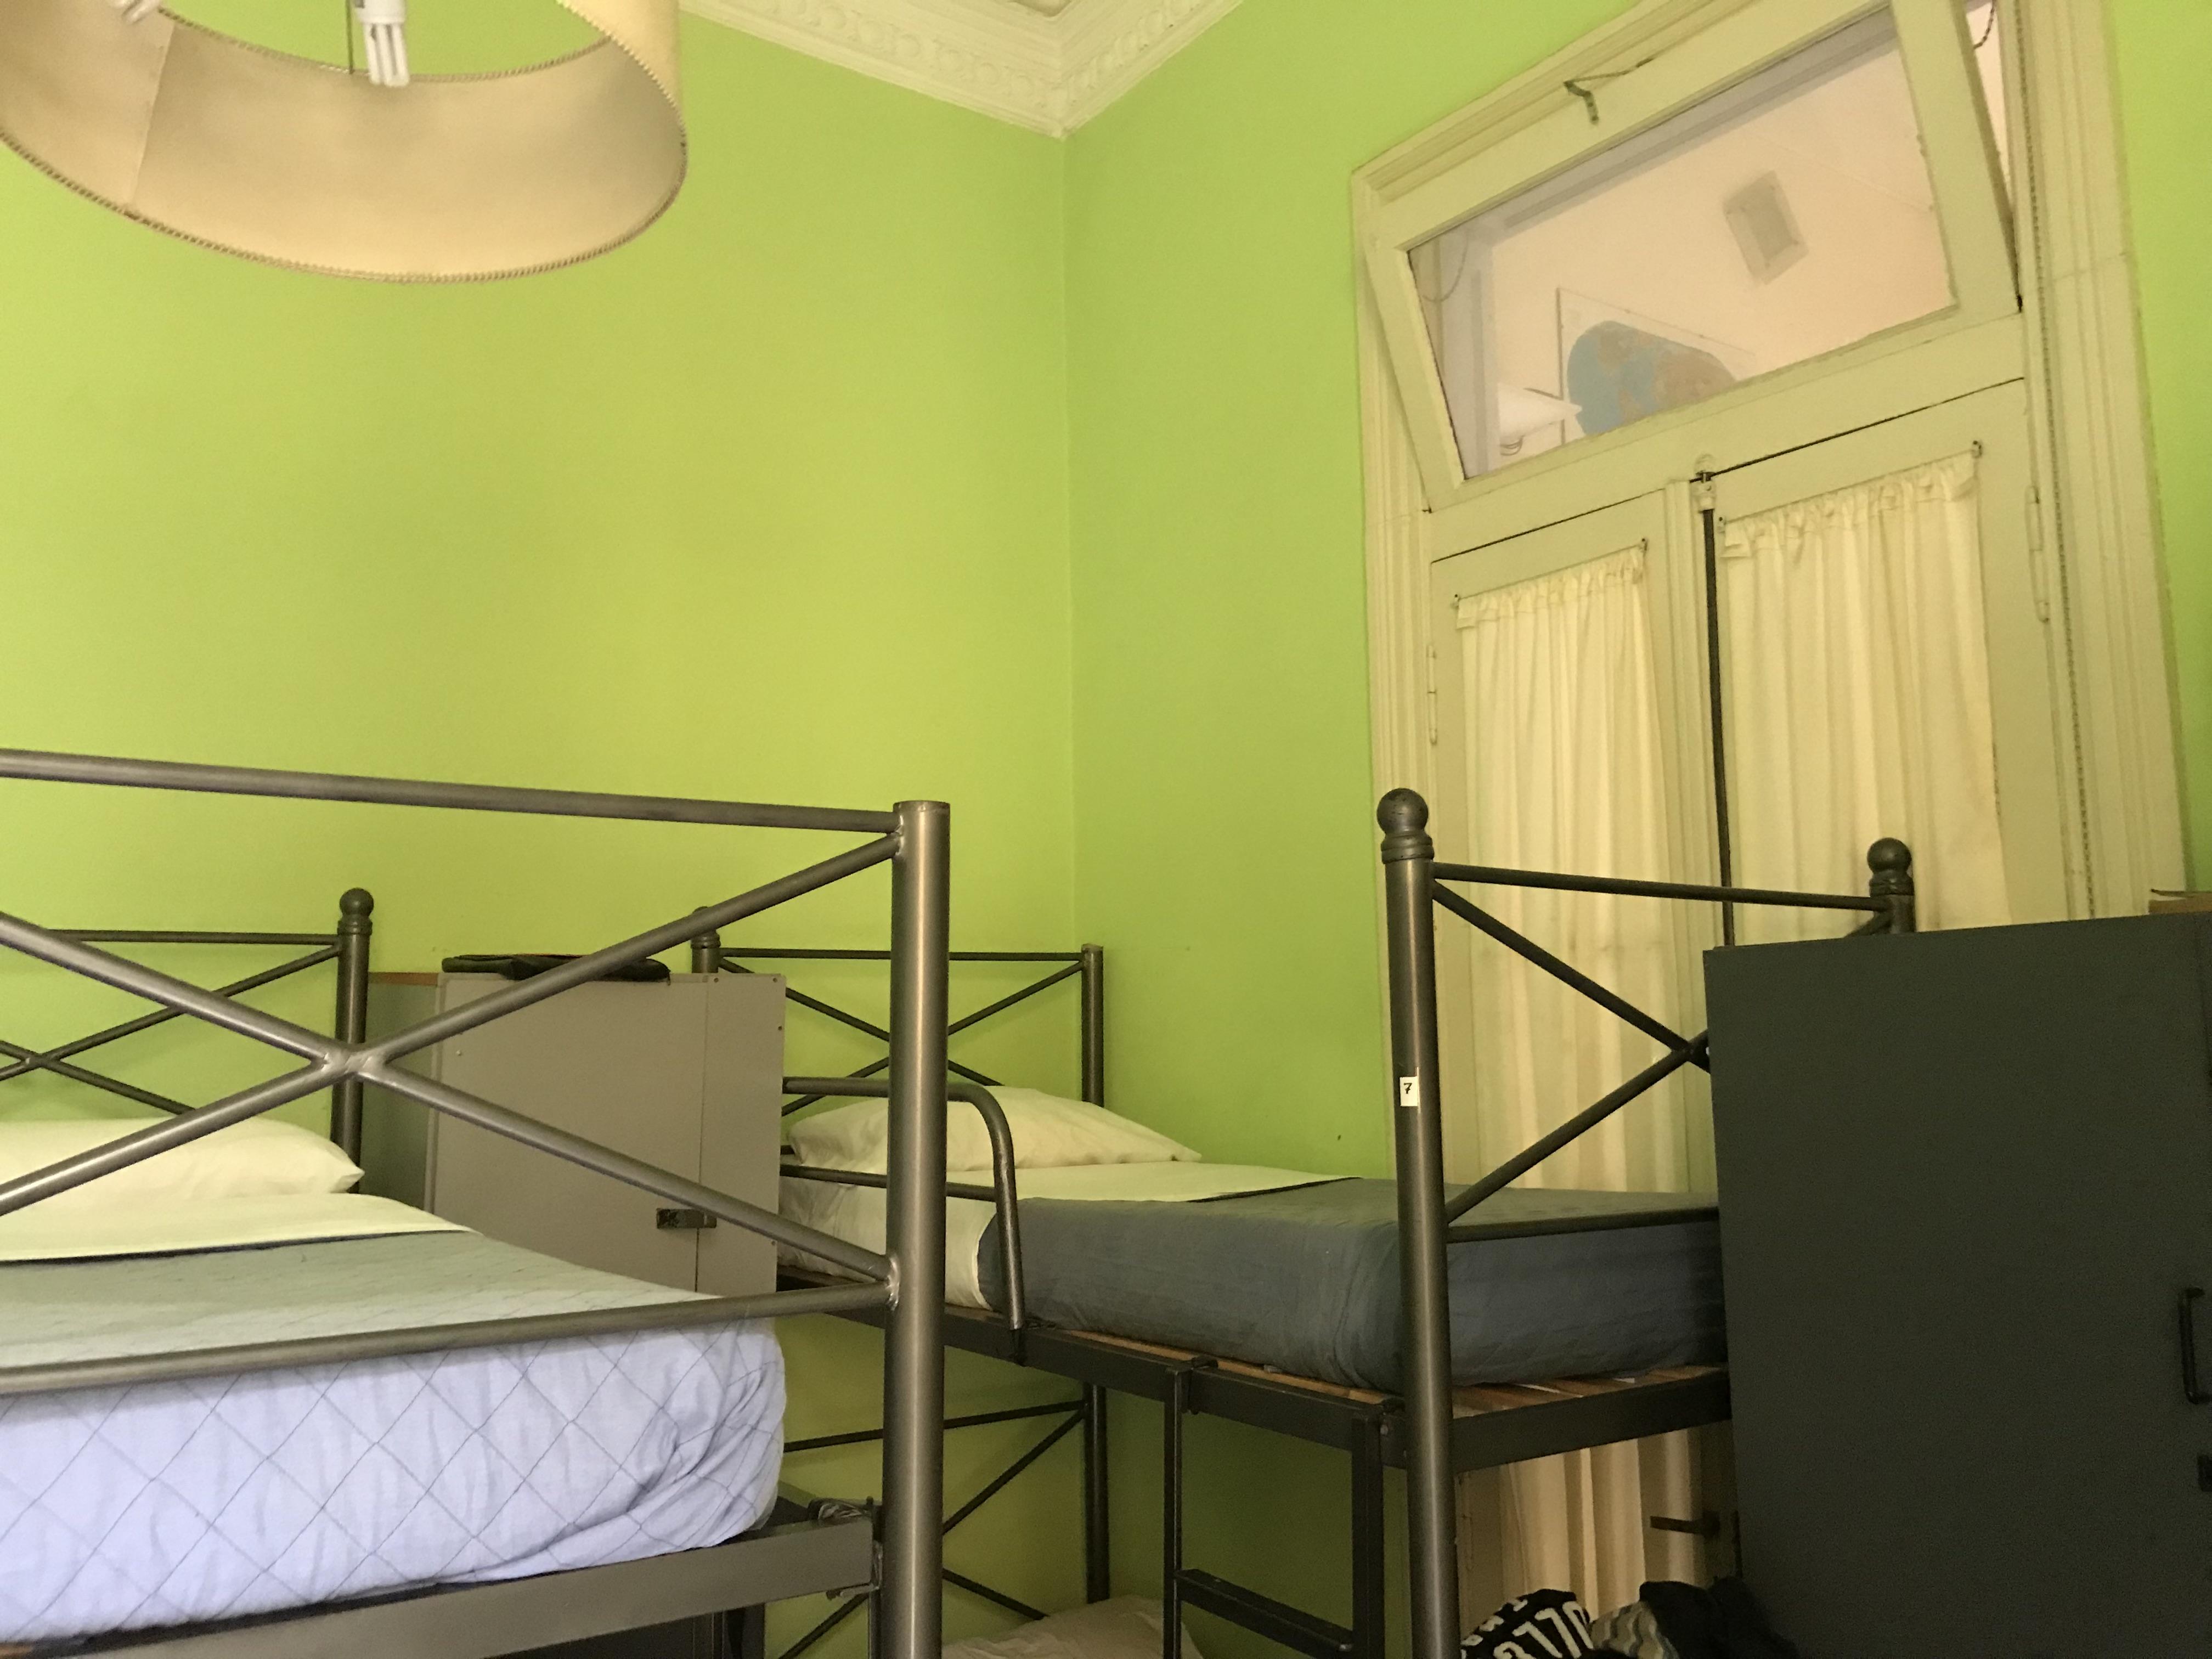 HOSTEL - Reina Madre Hostel